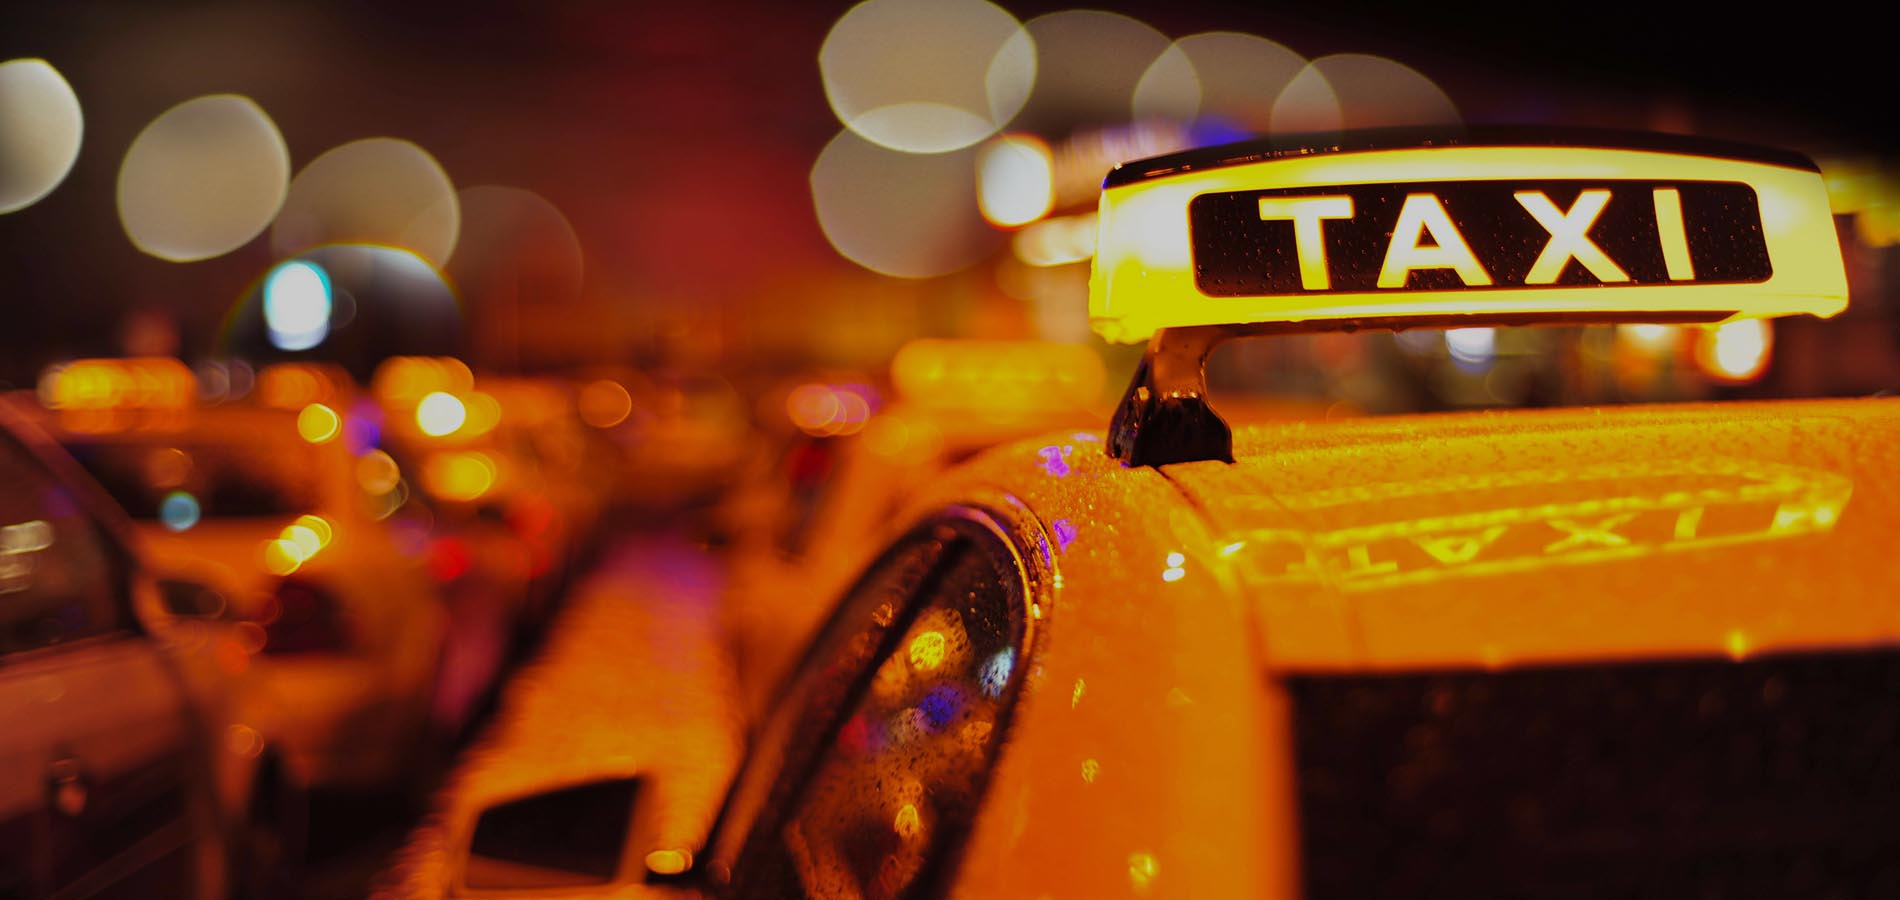 Cab Services in Gelioya